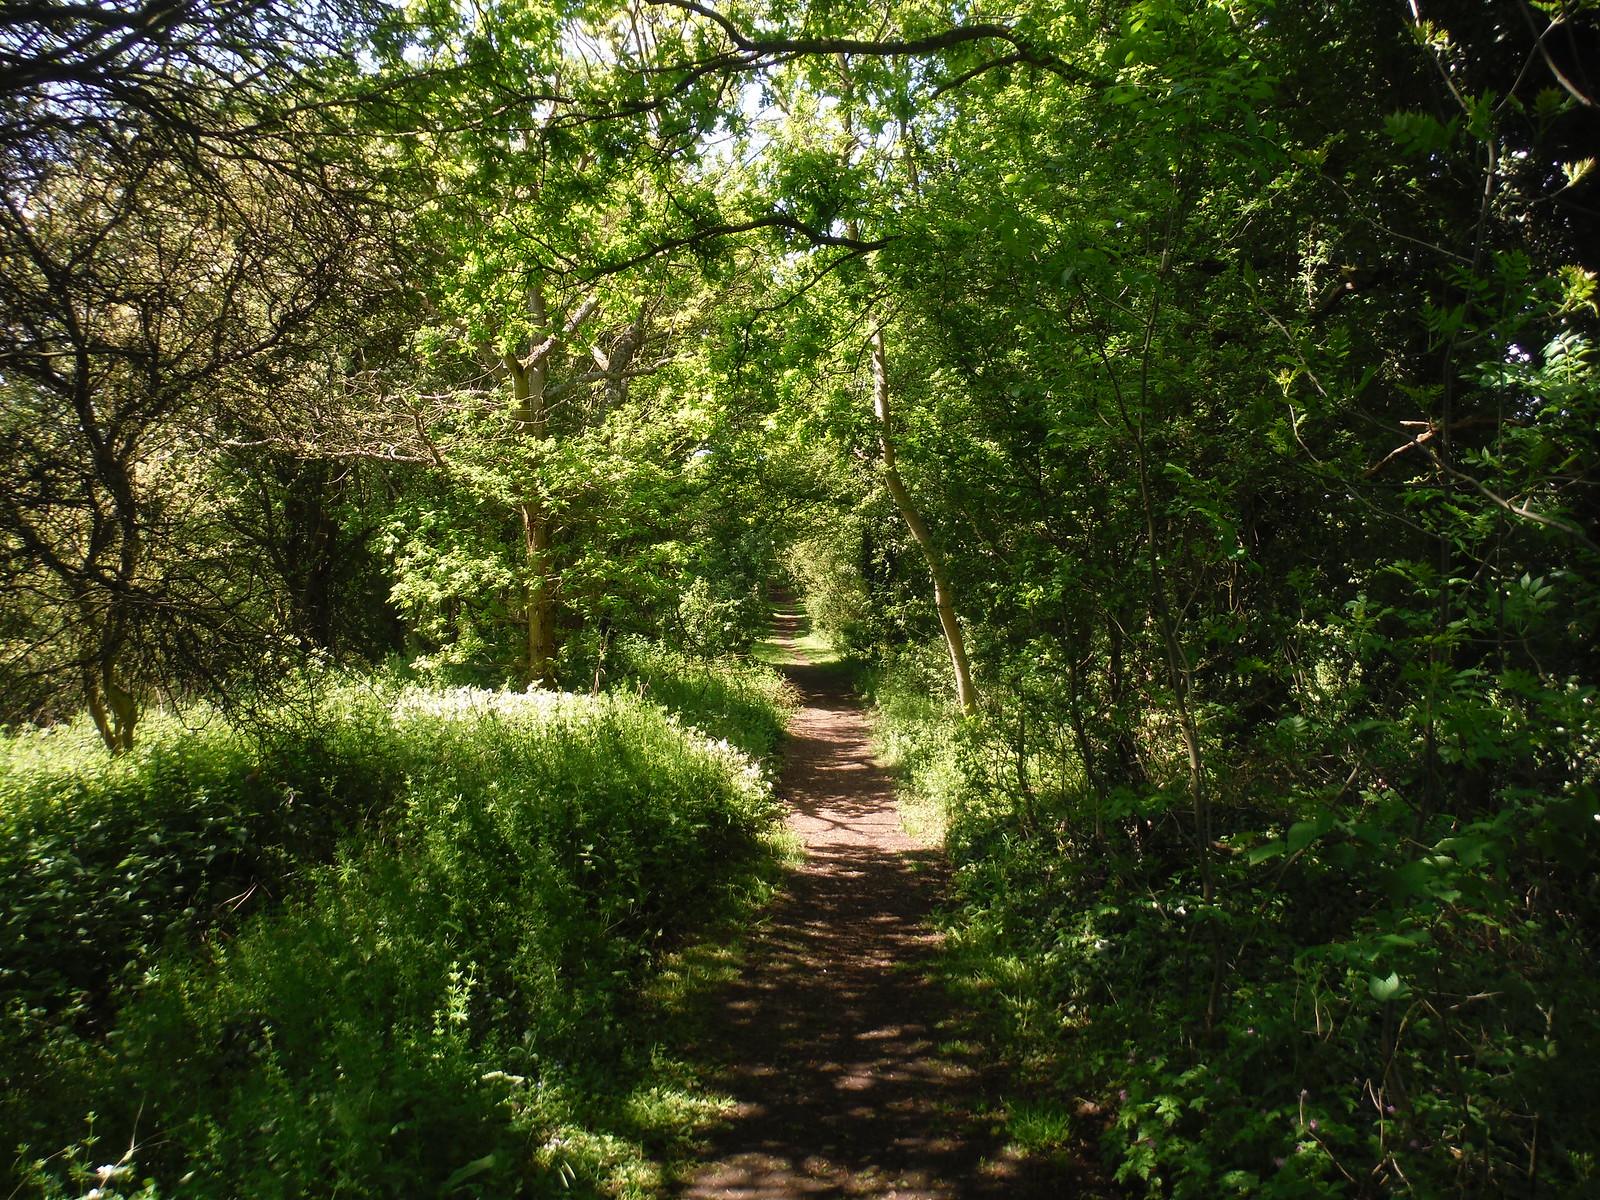 Course of Dismantled Railway (Oxford-Thame-Princes Risborough) SWC Walk 190 - Thame Circular (Extension)